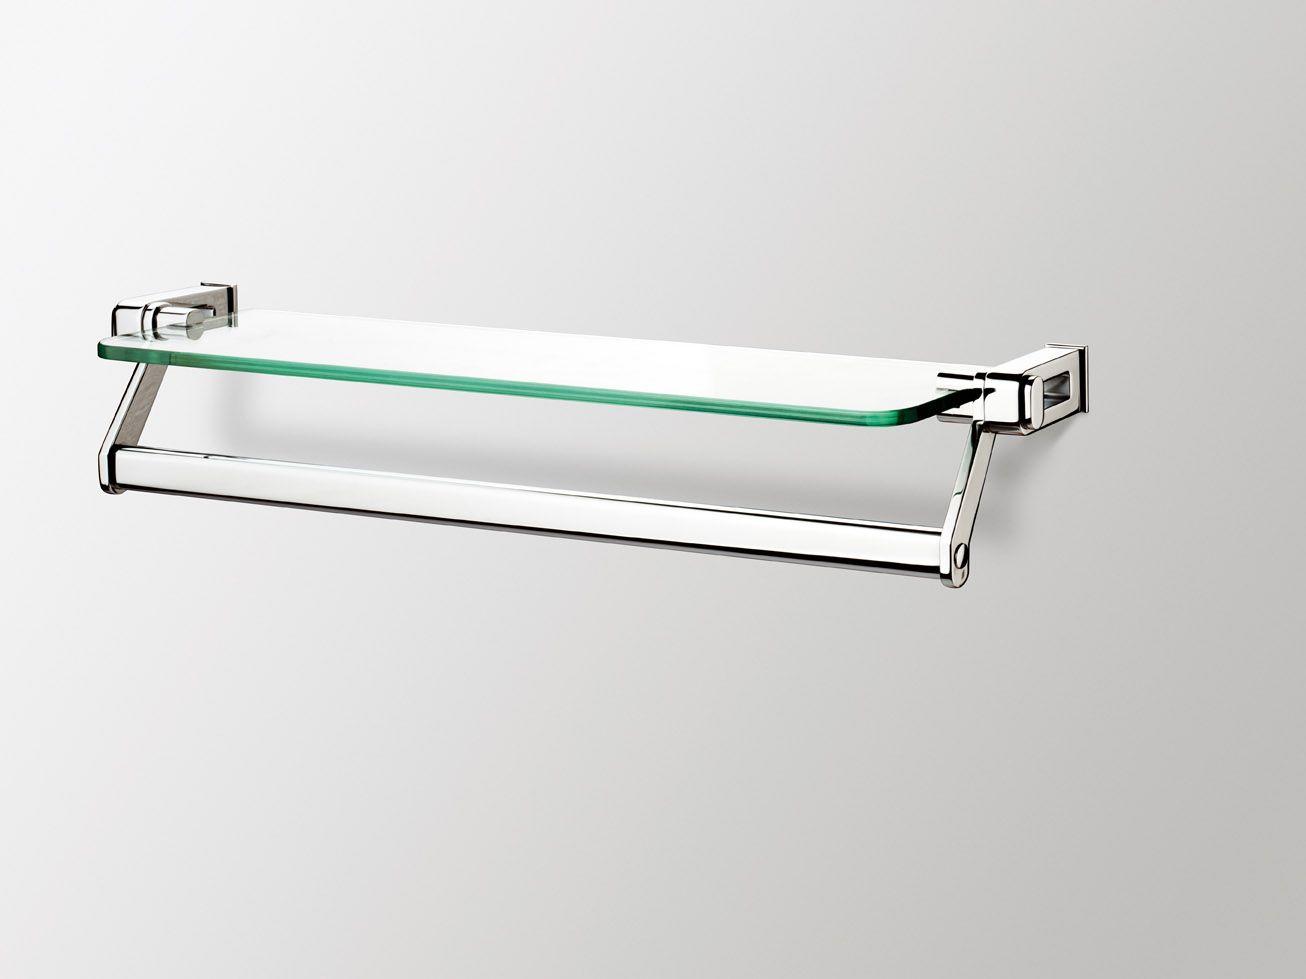 Sonia-Nakar-Glass-Shelf-with-Towel-Bar.jpg 1,306×979 pixels | Health ...